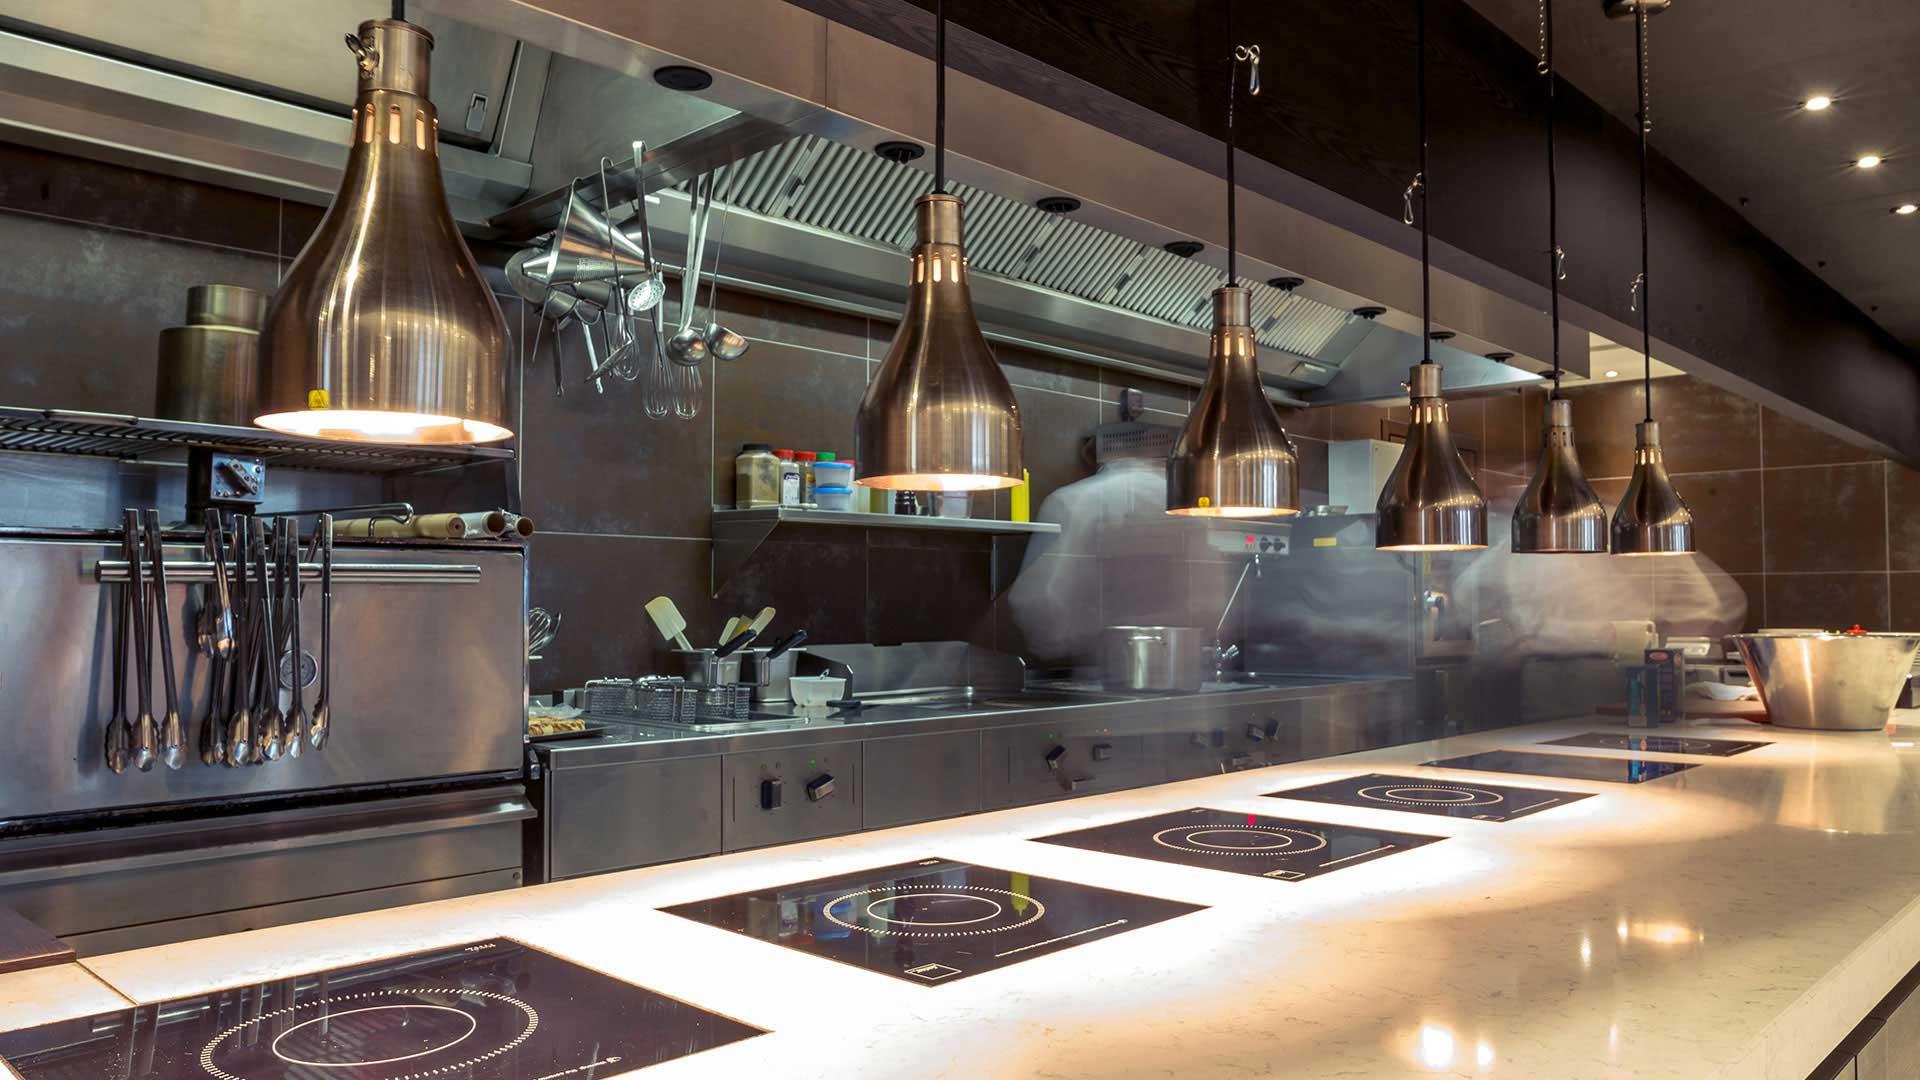 Slider Senkron Mutfak Endüstriyel Mutfak